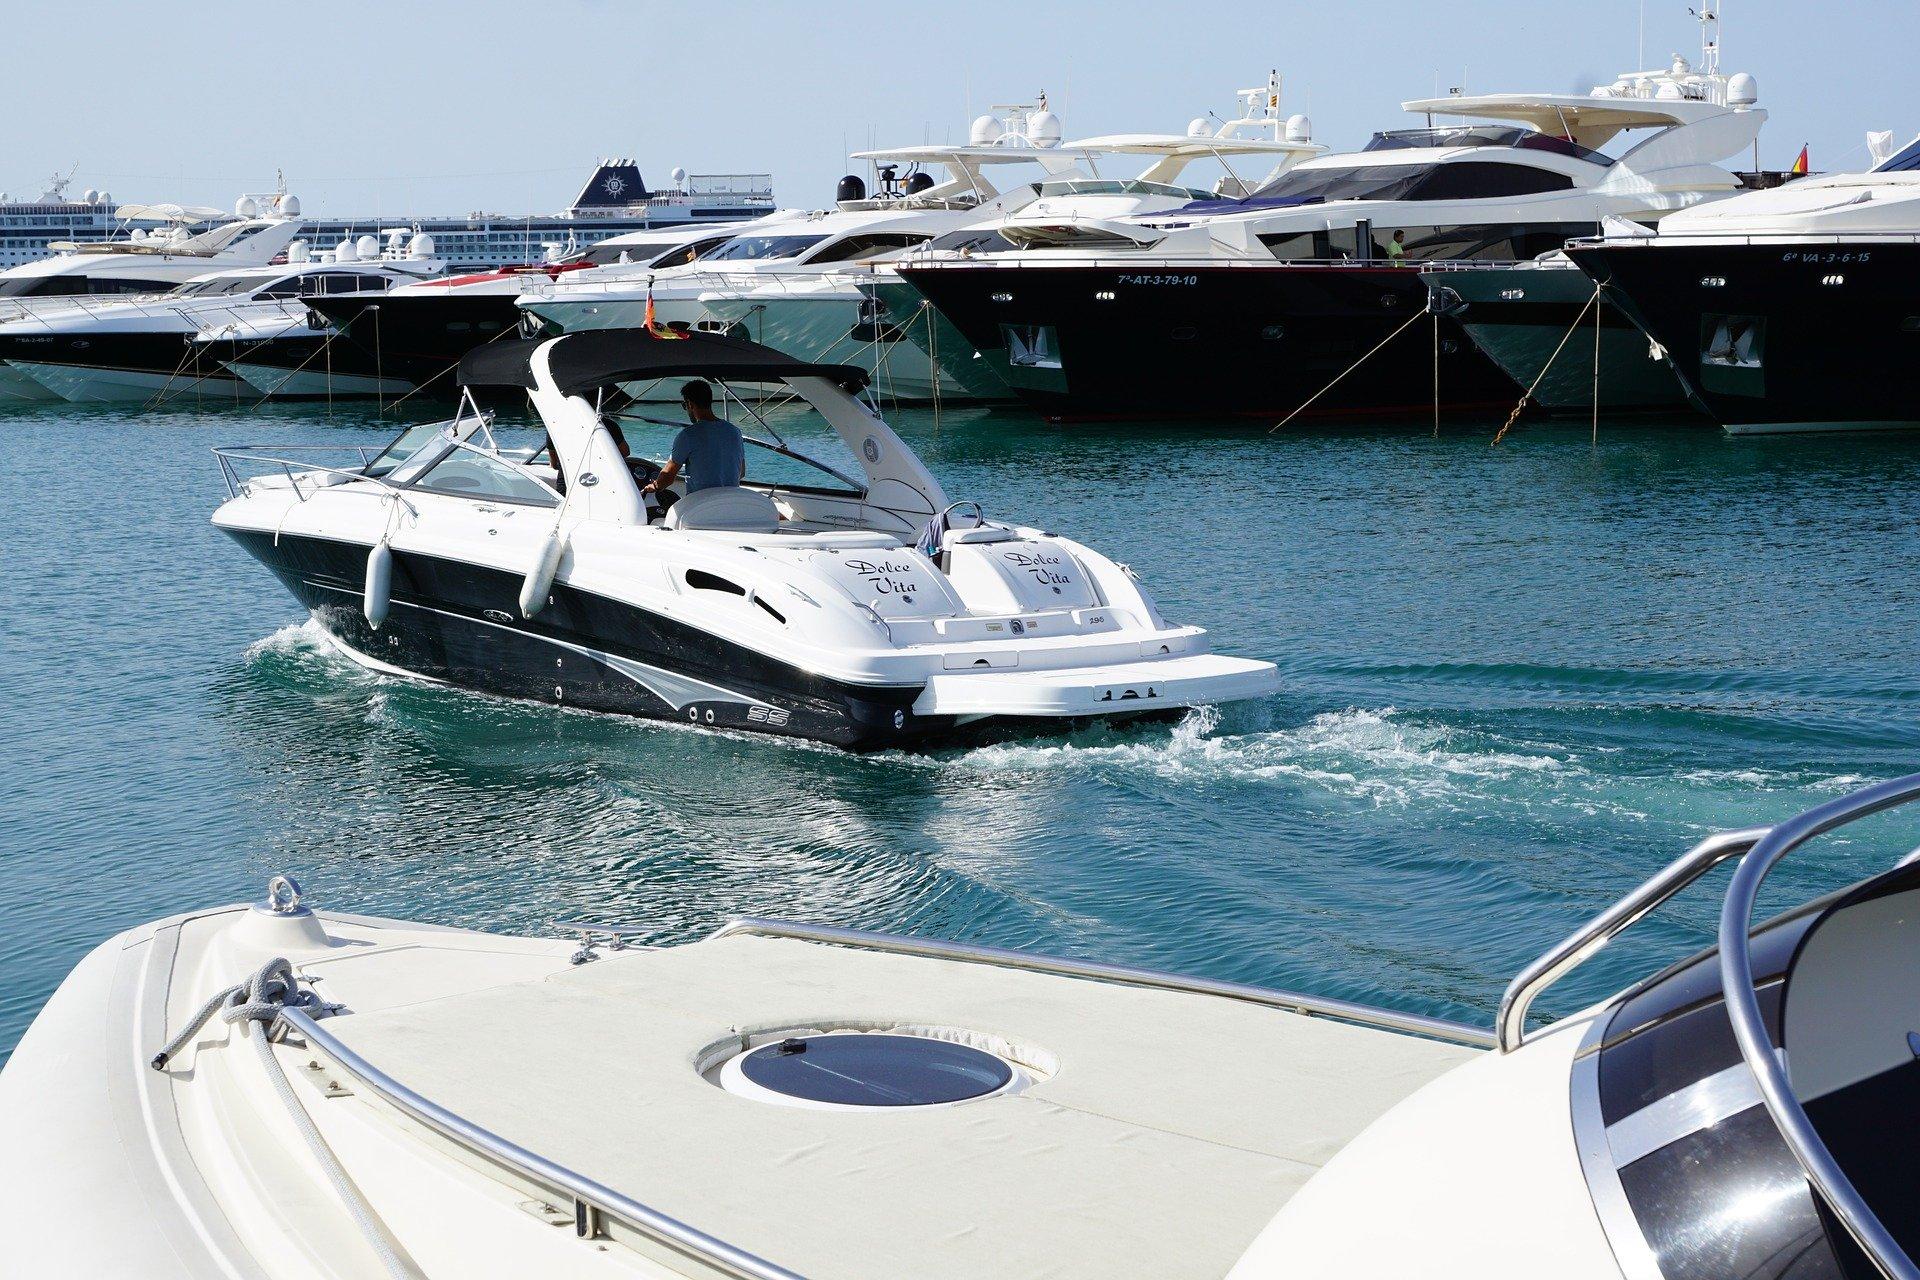 Séminaire Ibiza - Location bateau